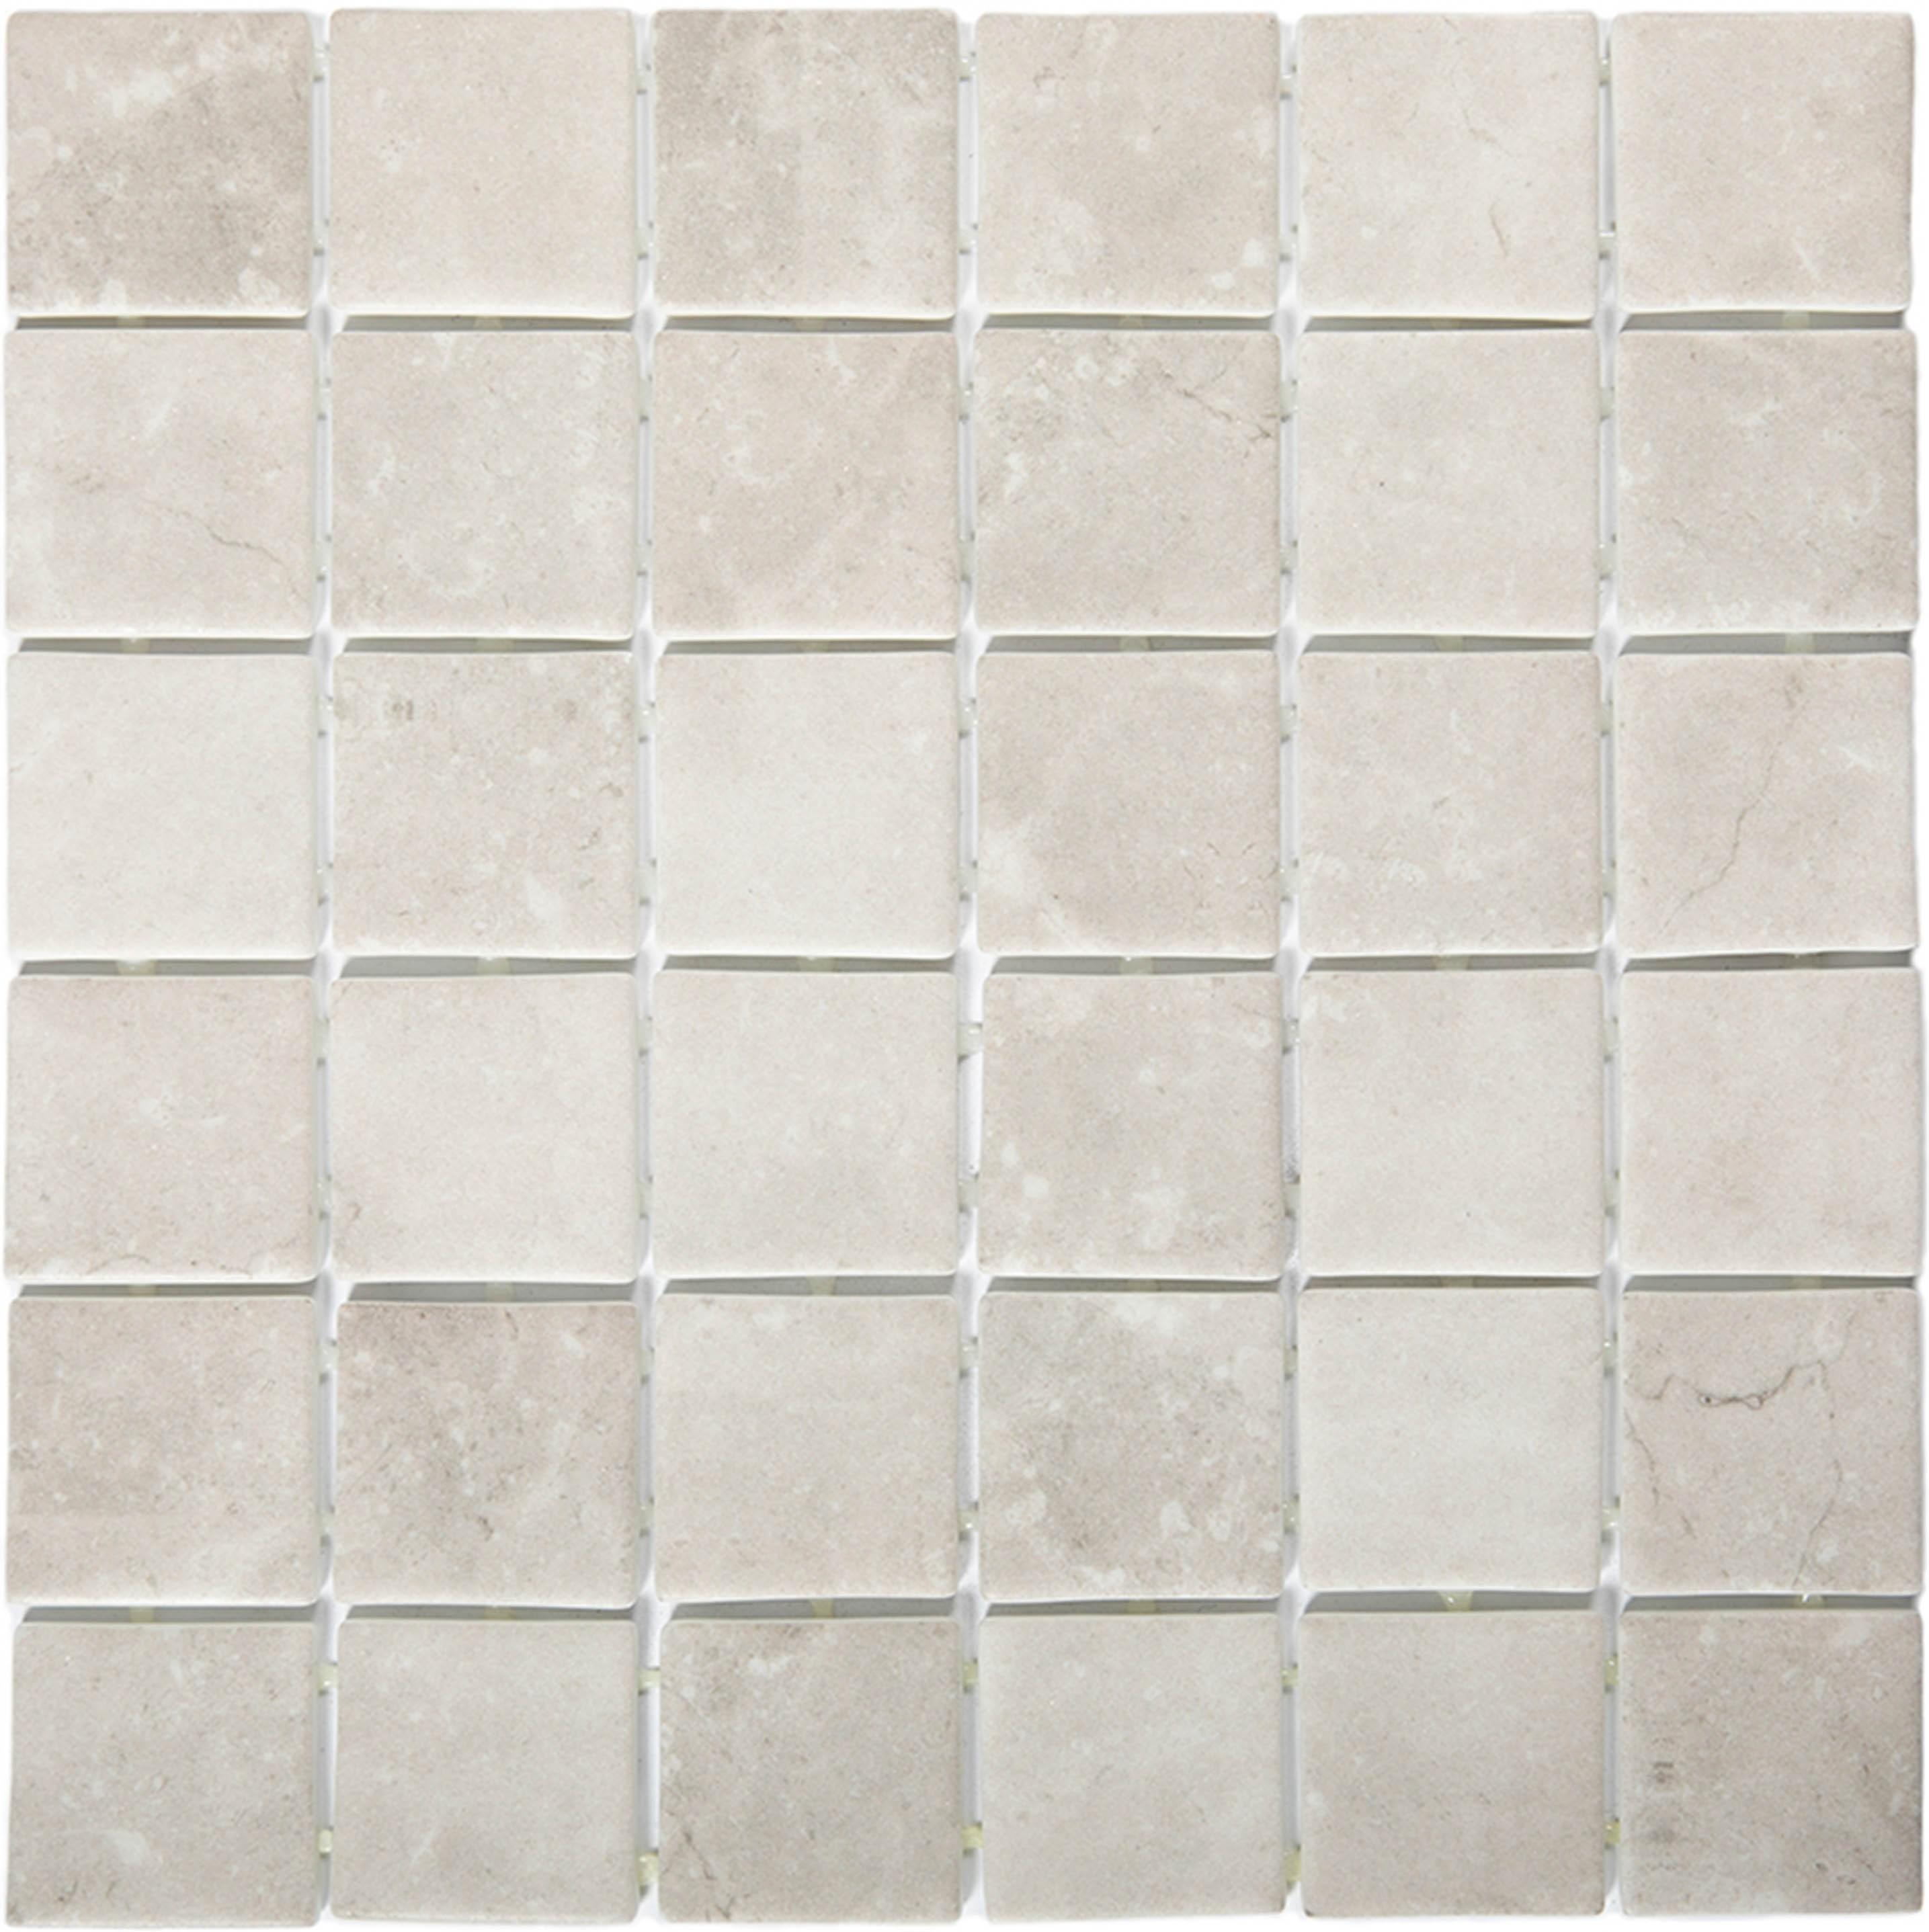 Pool-Tiles Hero Onix Fragment-hero-gallery-2